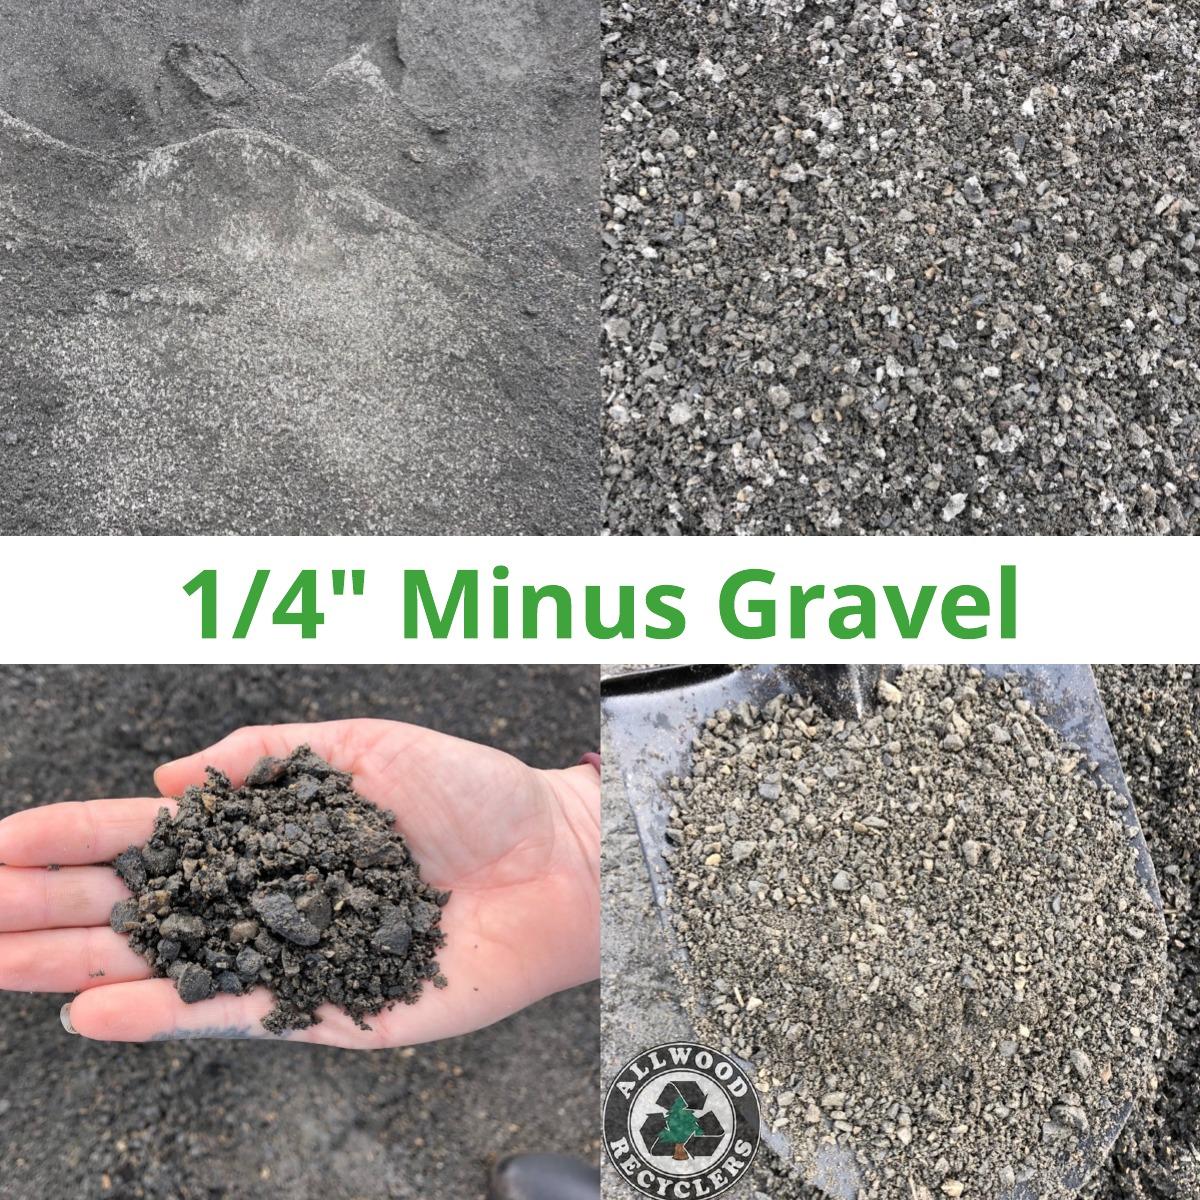 1/4 Minus Gravel